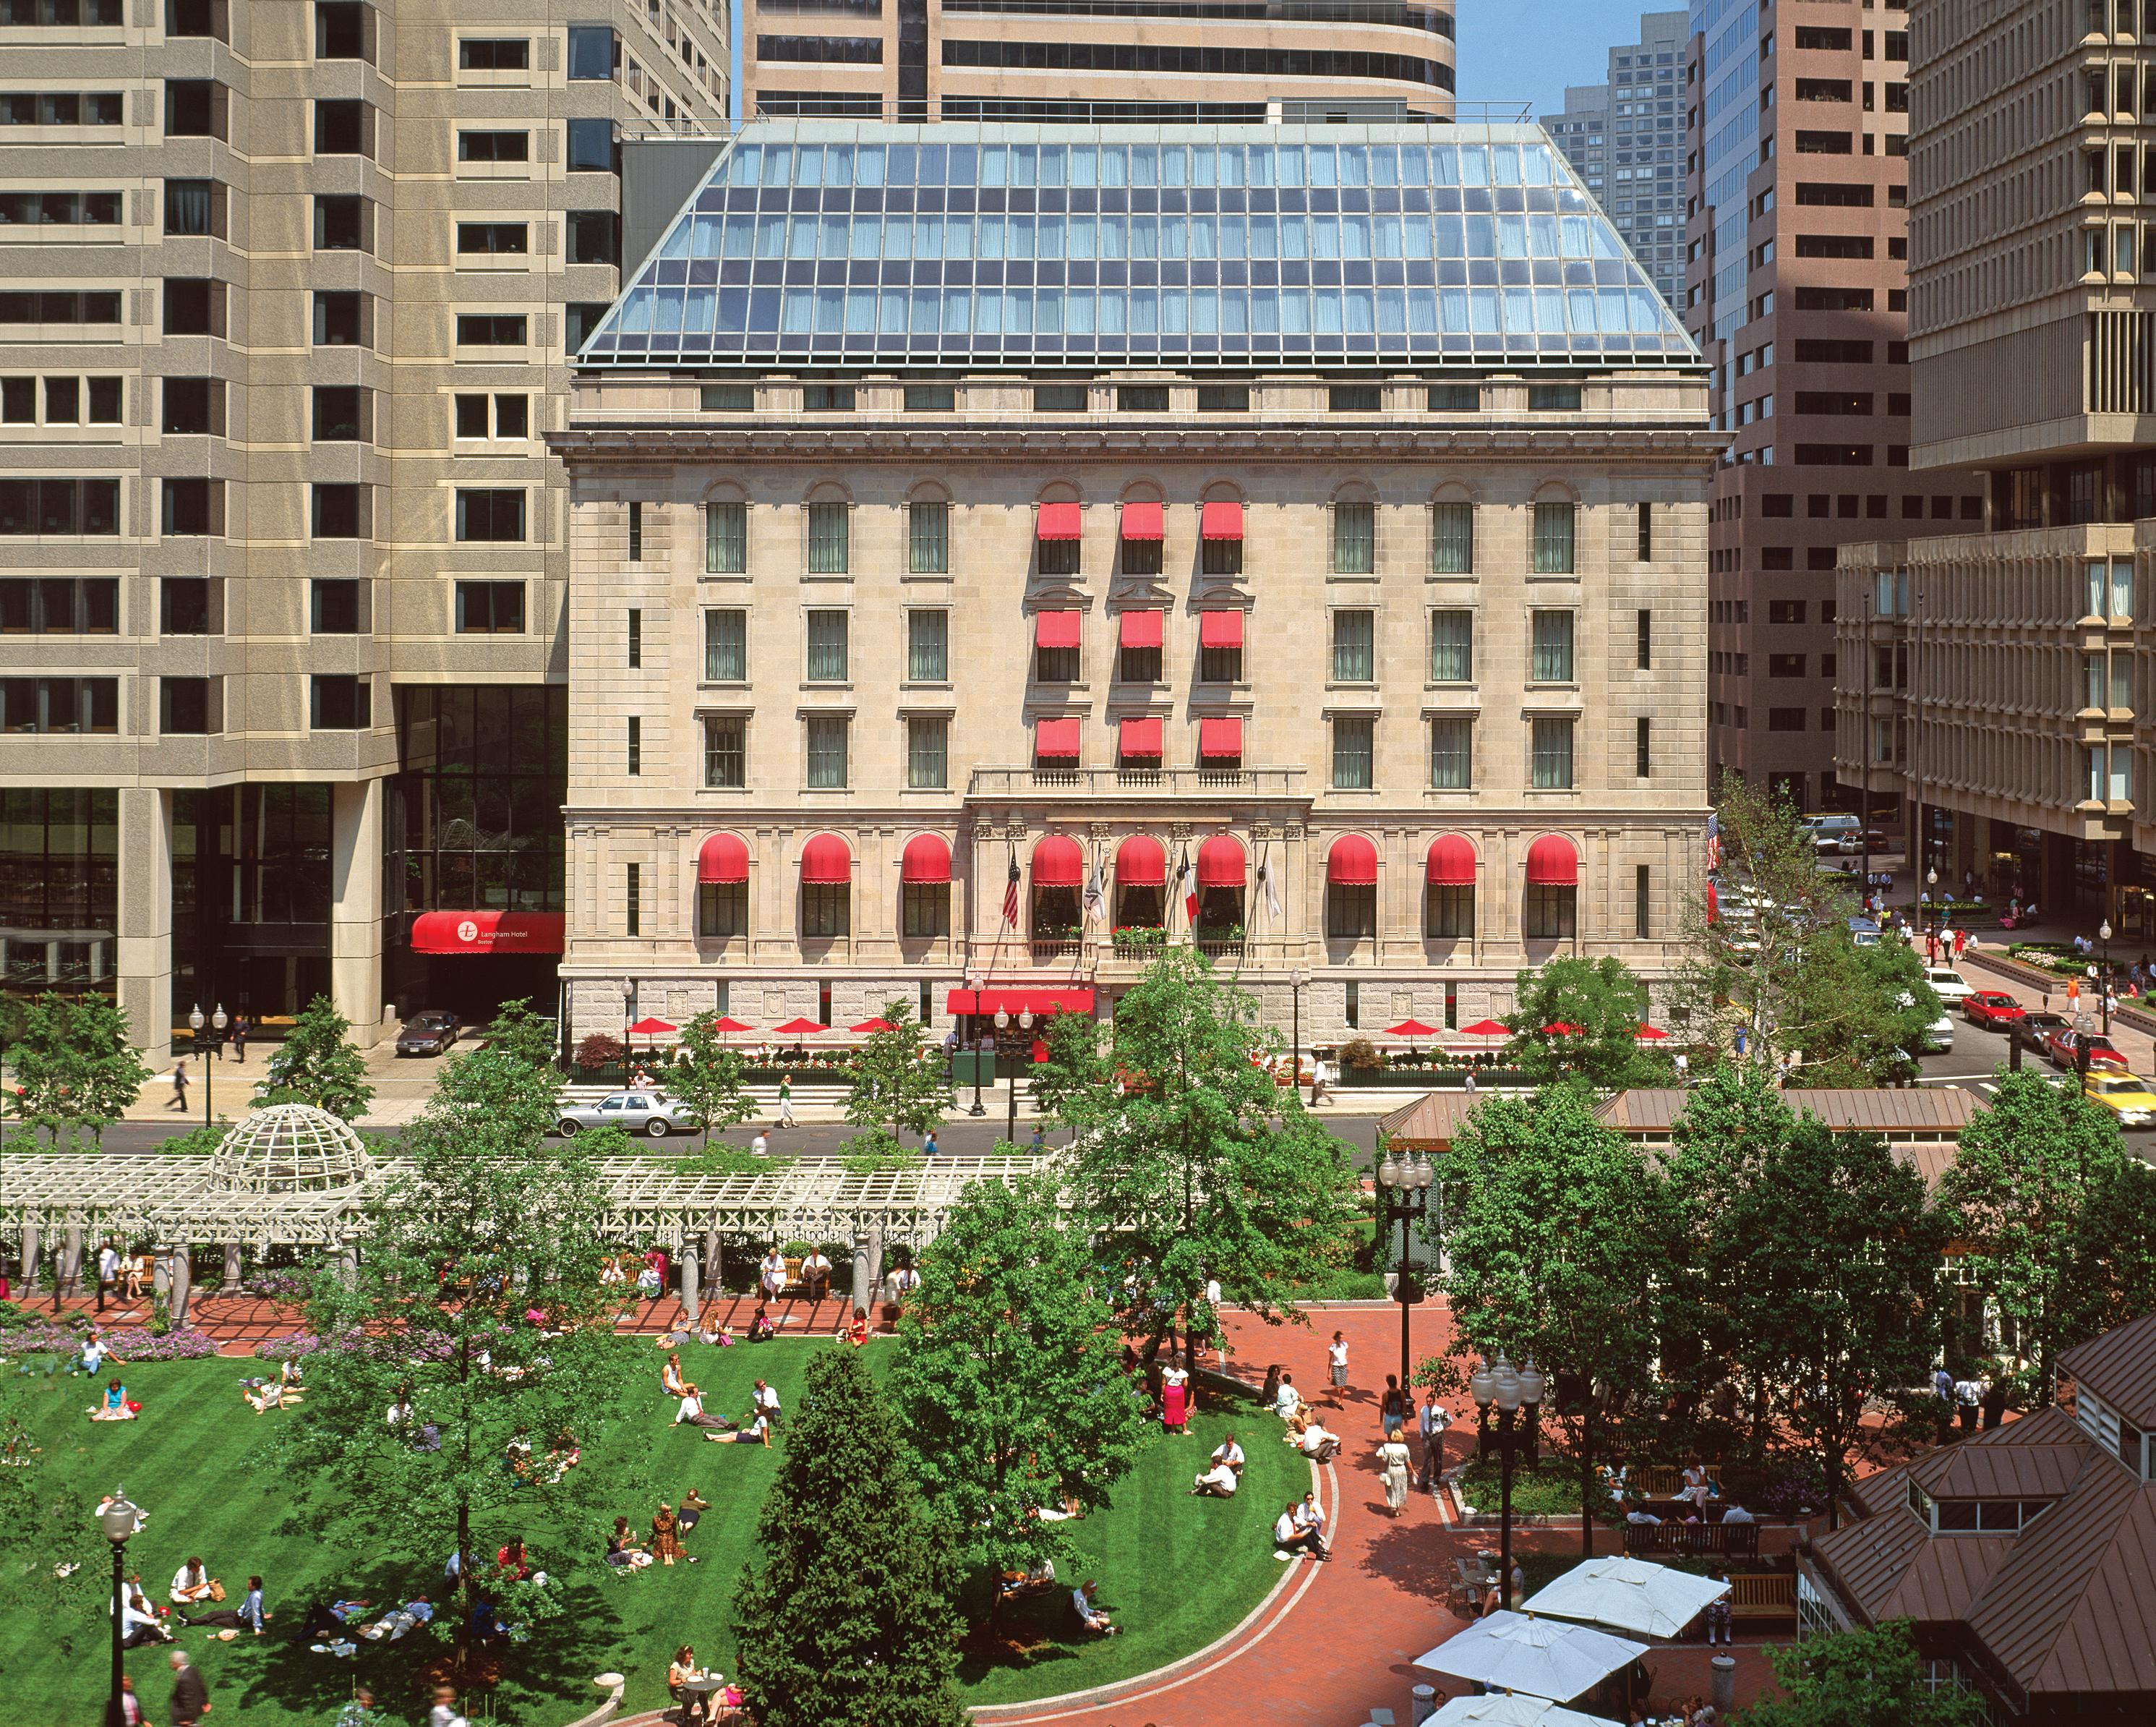 Boston Park Hotel